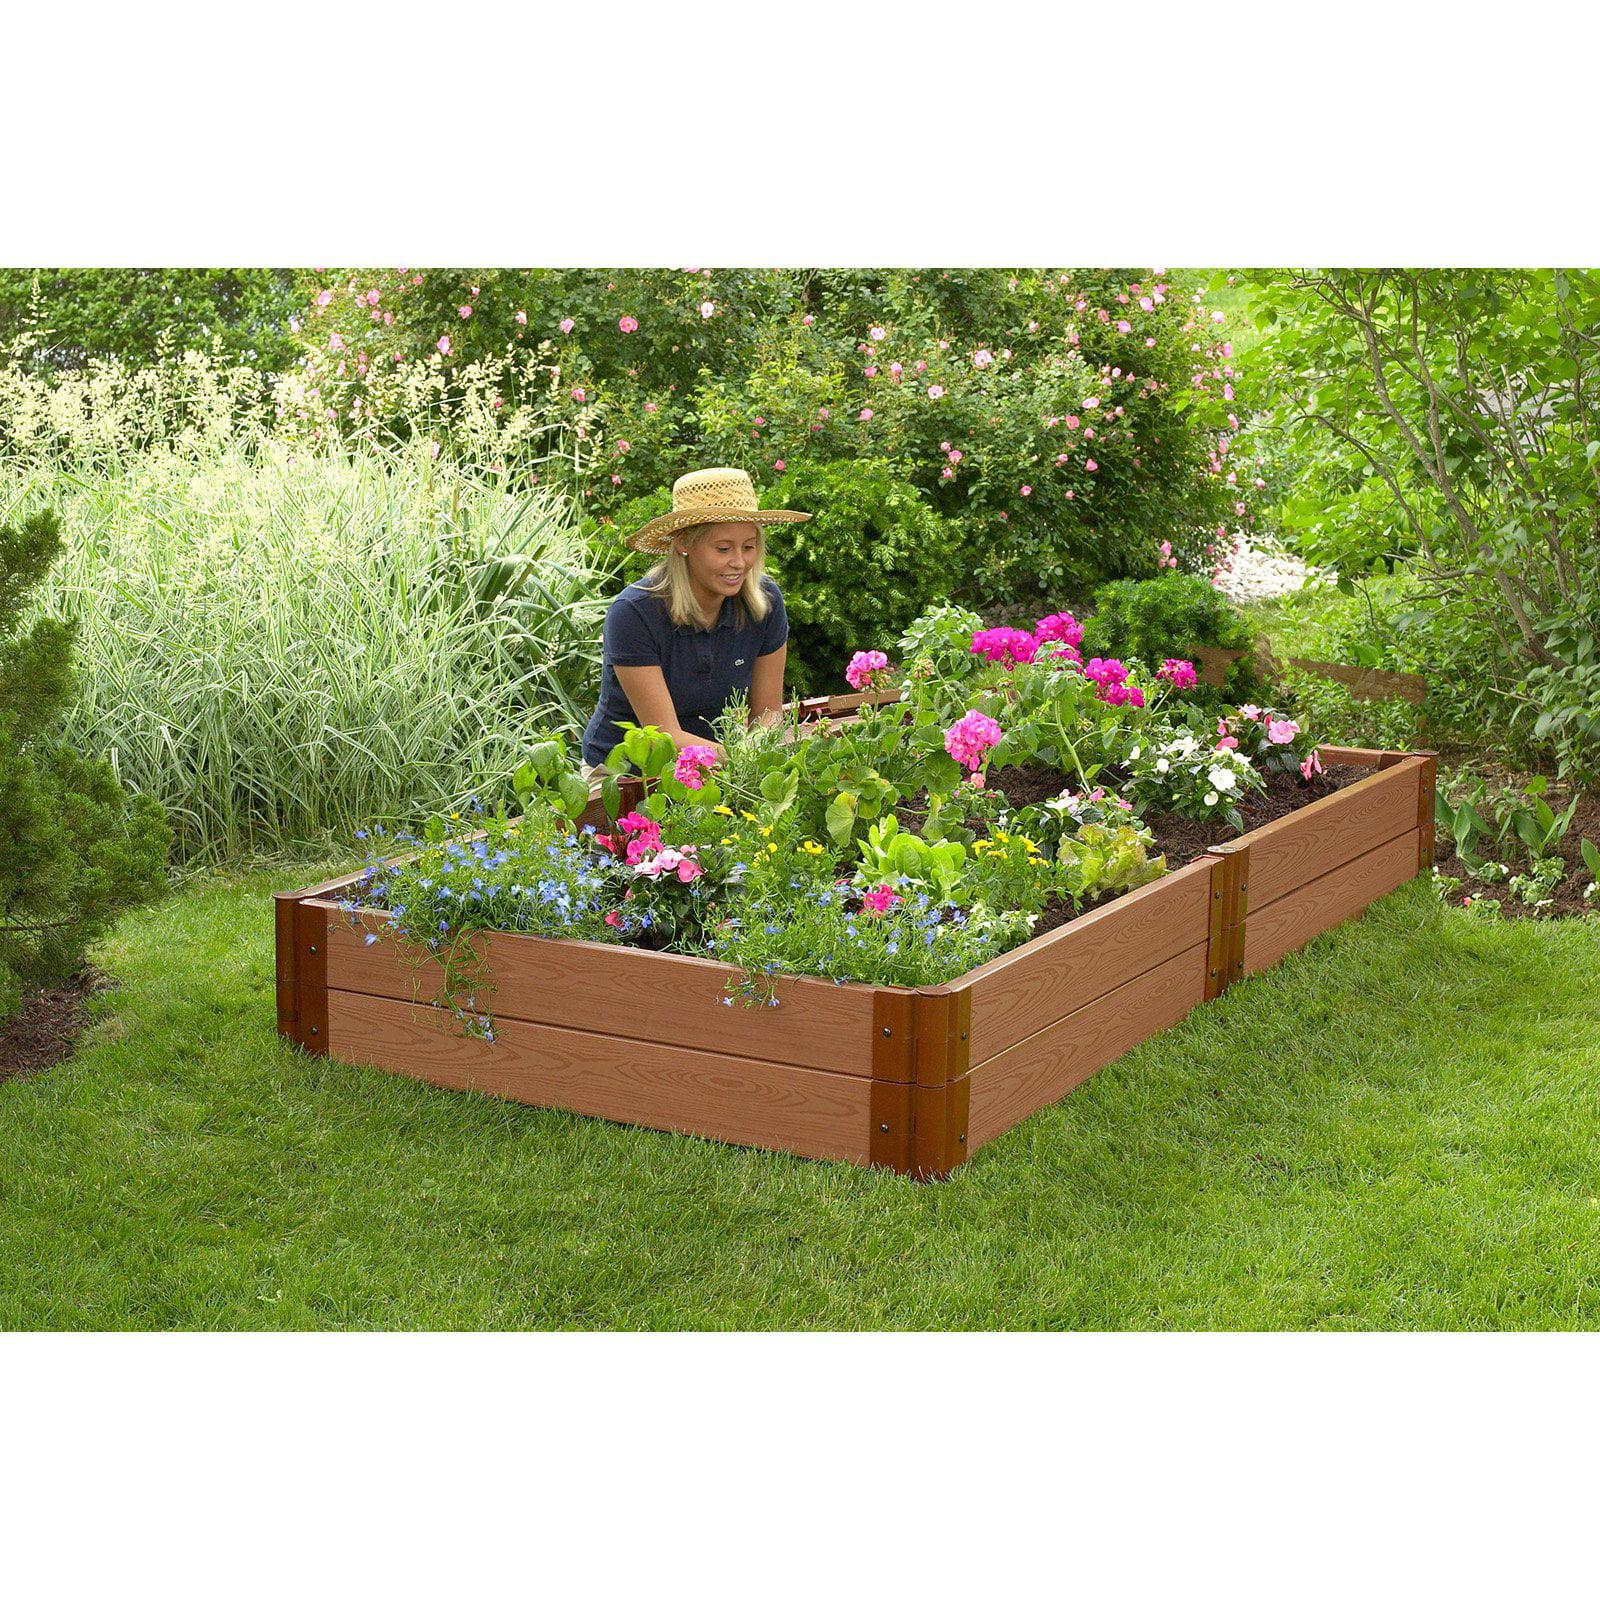 Classic Sienna Raised Garden Bed 4 x 8 x 11 2 profile